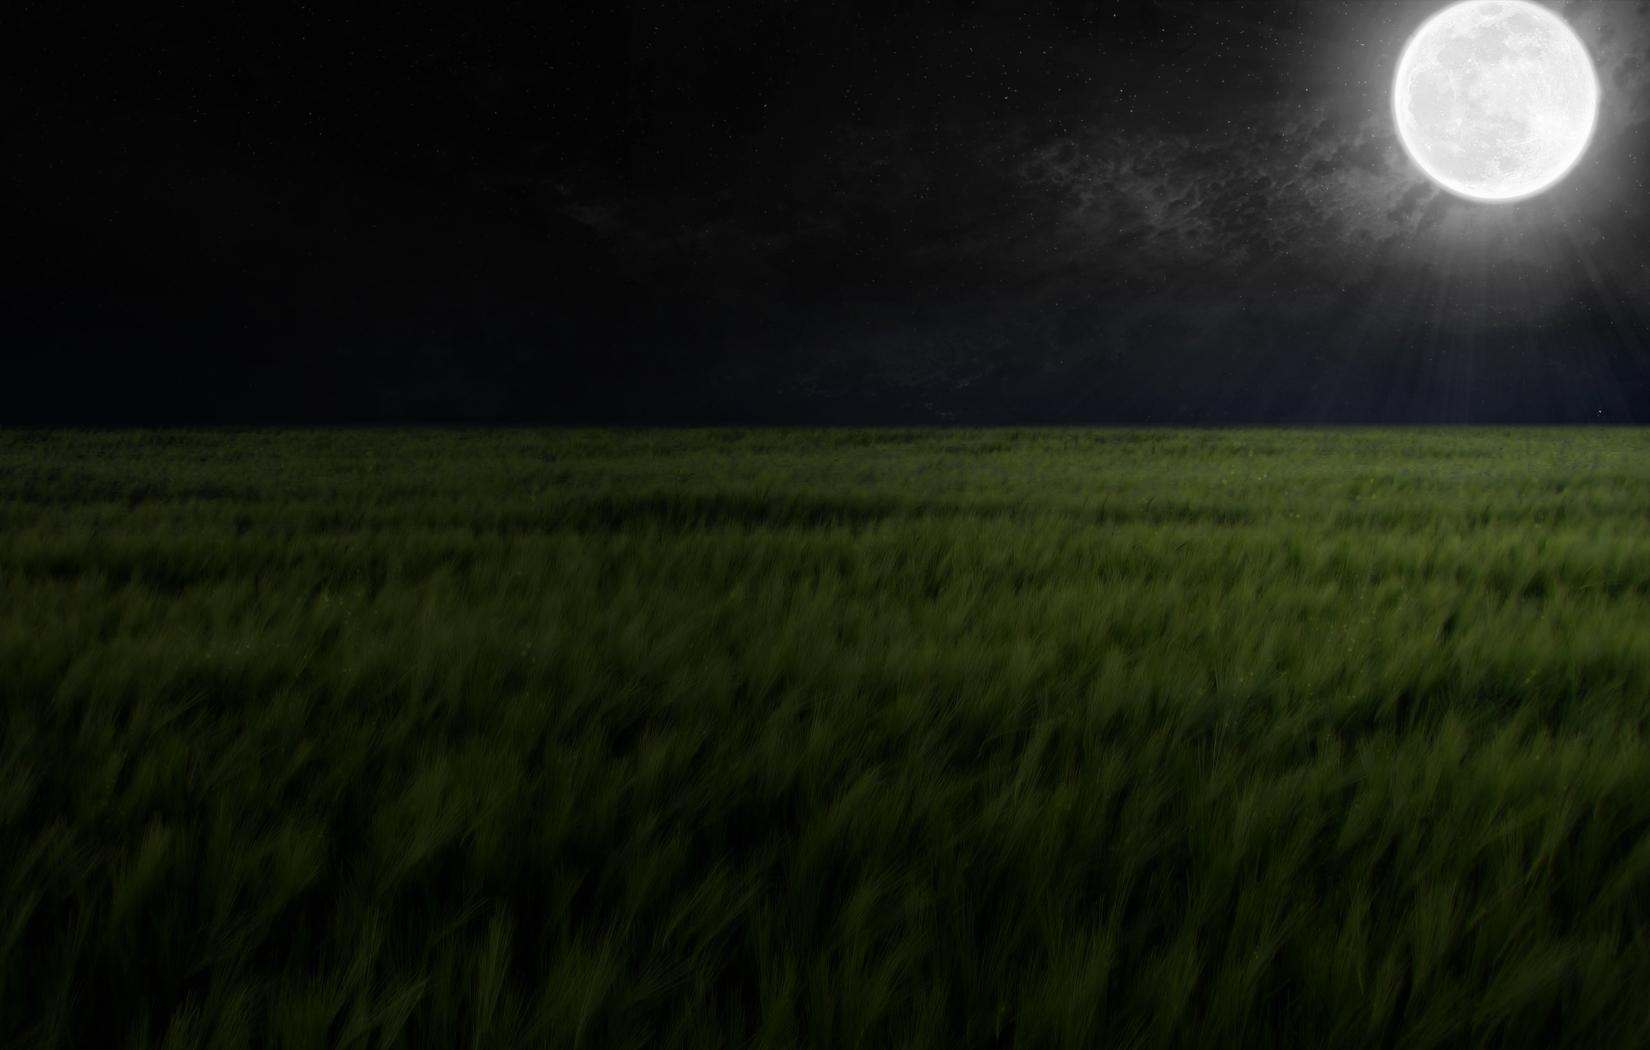 Dark Rye Wallpaper and Background Image 1650x1050 ID100453 1650x1050